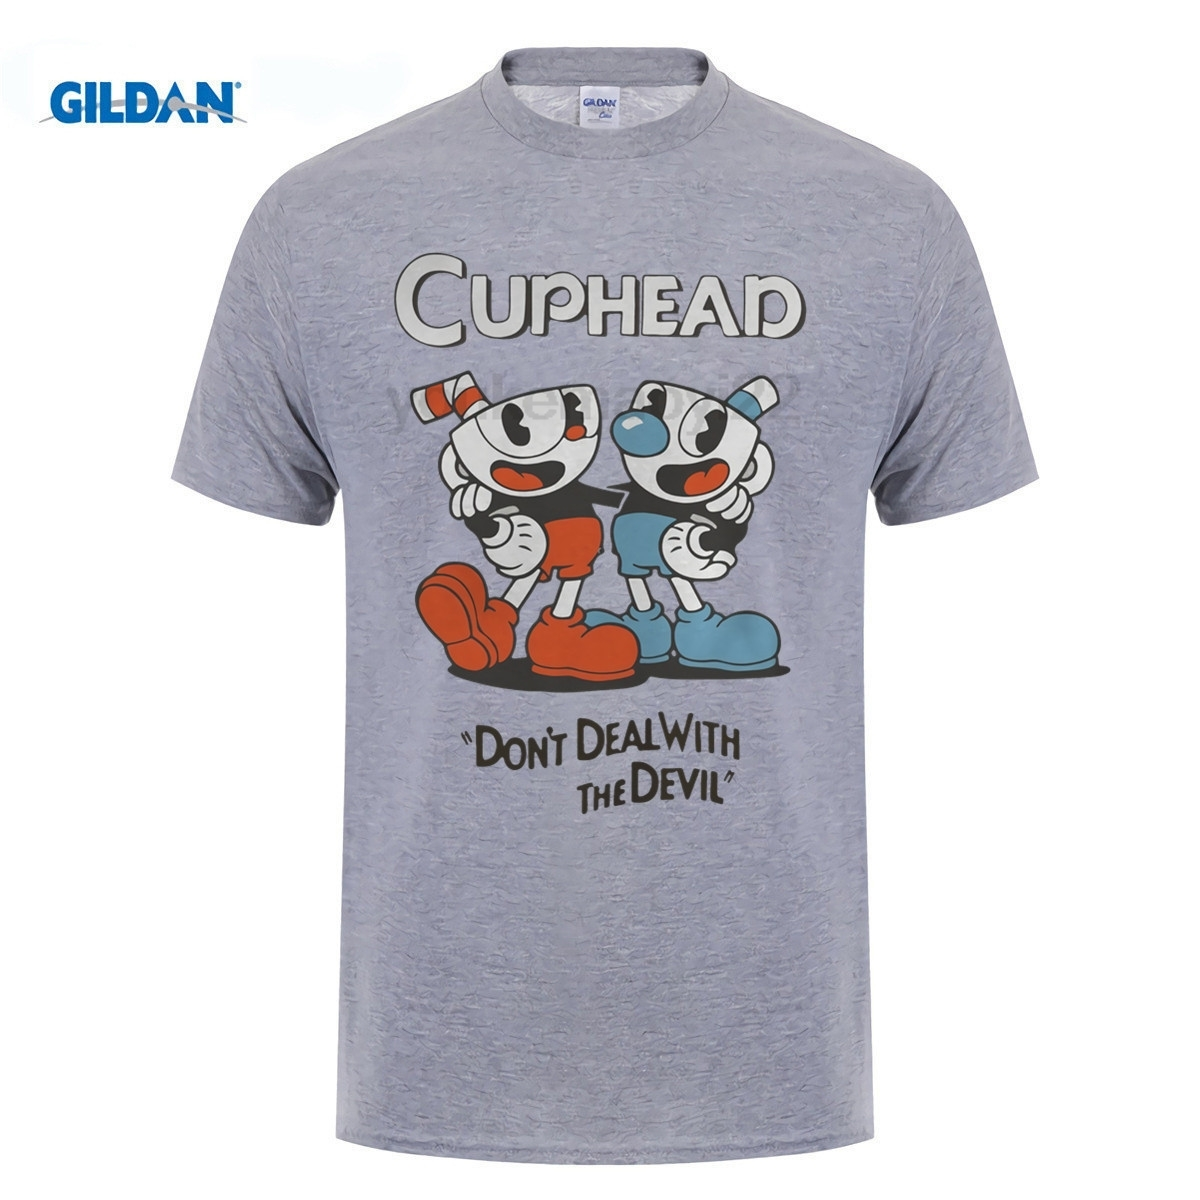 GILDAN Cuphead don't deal with the devil shirtsweatshirttank top Hip-Hop T-Shirt Short Sleeve Asian Size Mens